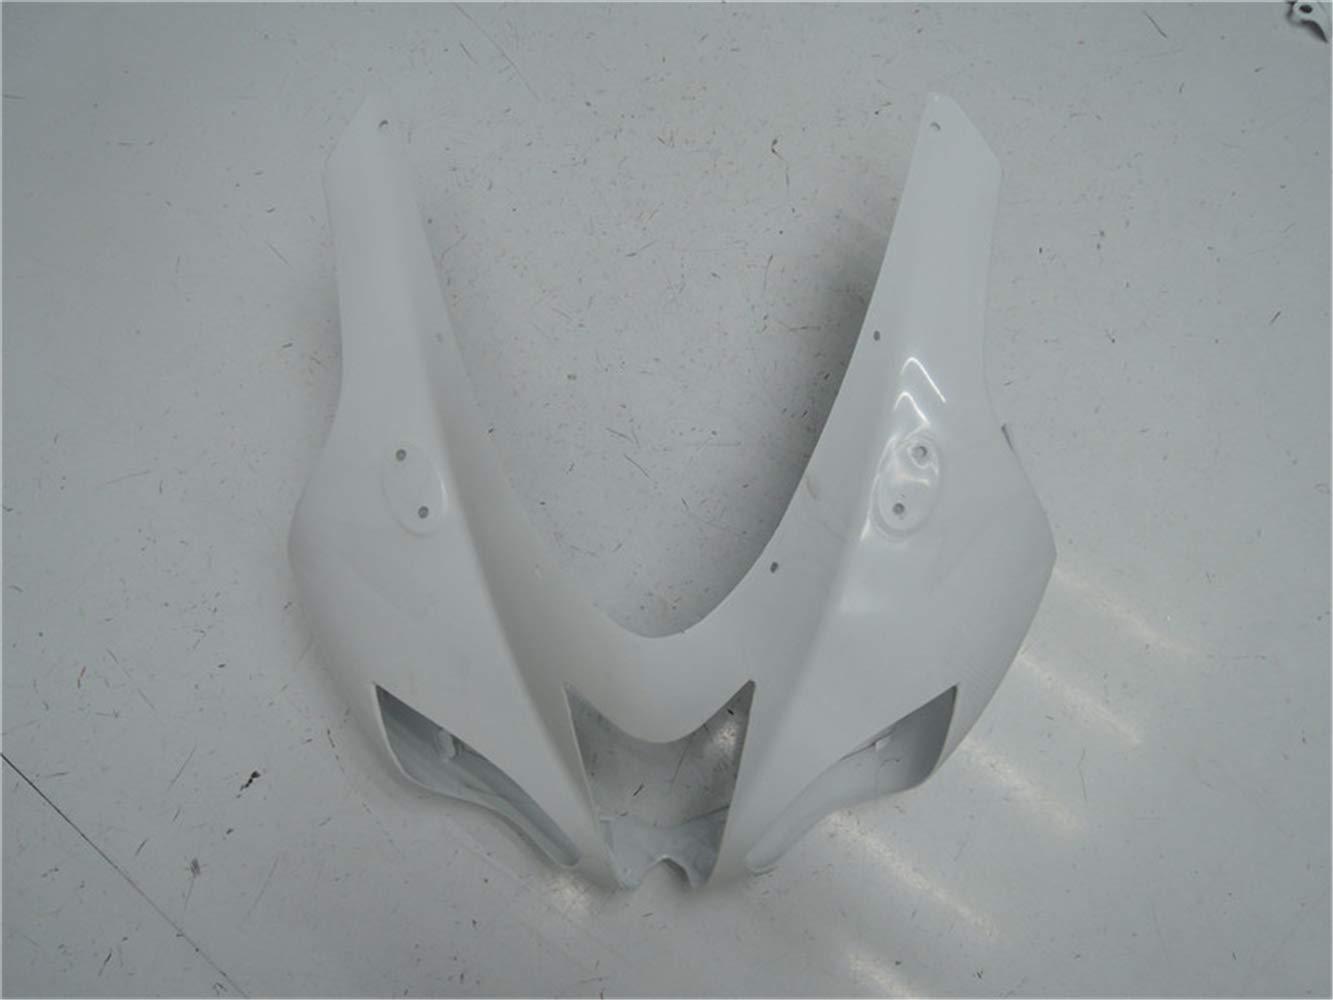 Unpainted Plastic Bodywork Fairing Fit for KAWASAKI NINJA 2000 2001 2002 ZX6R 636 Injection Mold ABS New Aftermarket Bodyframe Kit Set 00 01 02